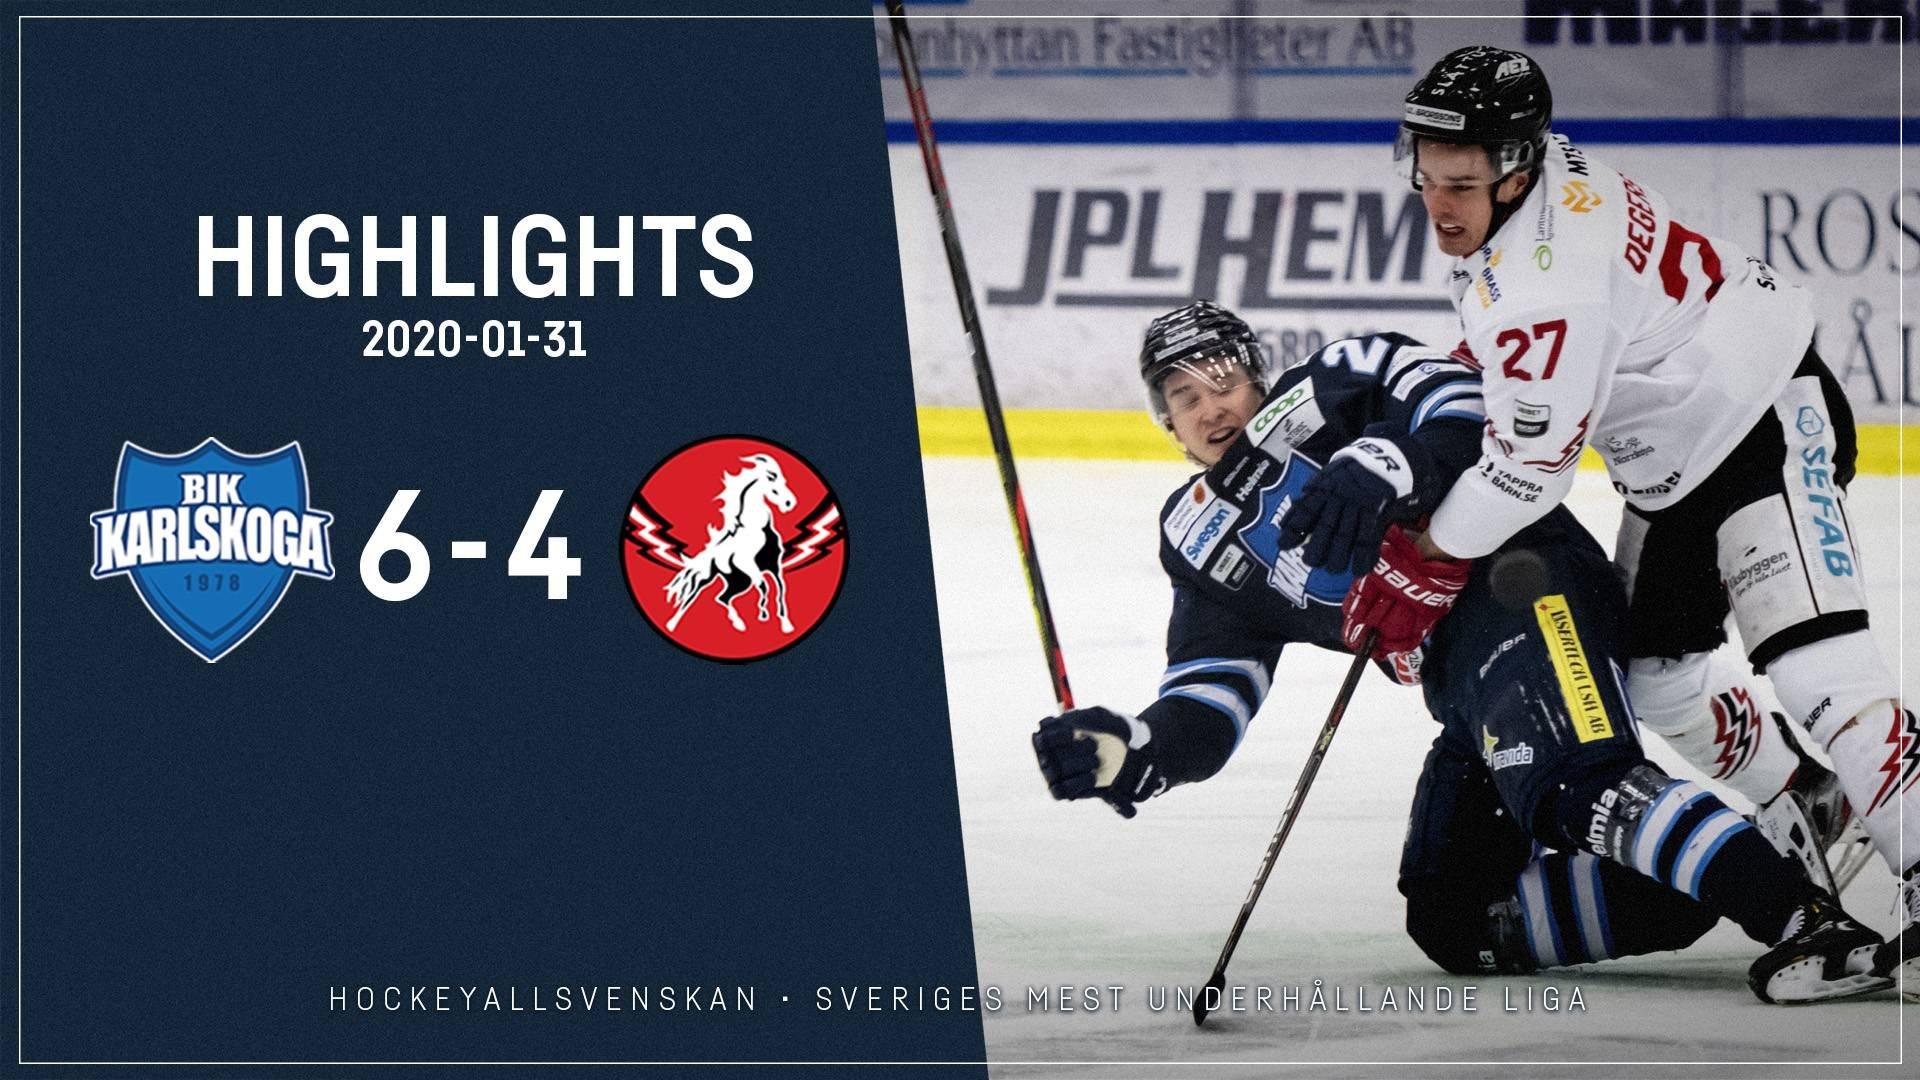 2020-01-31 Karlskoga - Vita Hästen 6-4